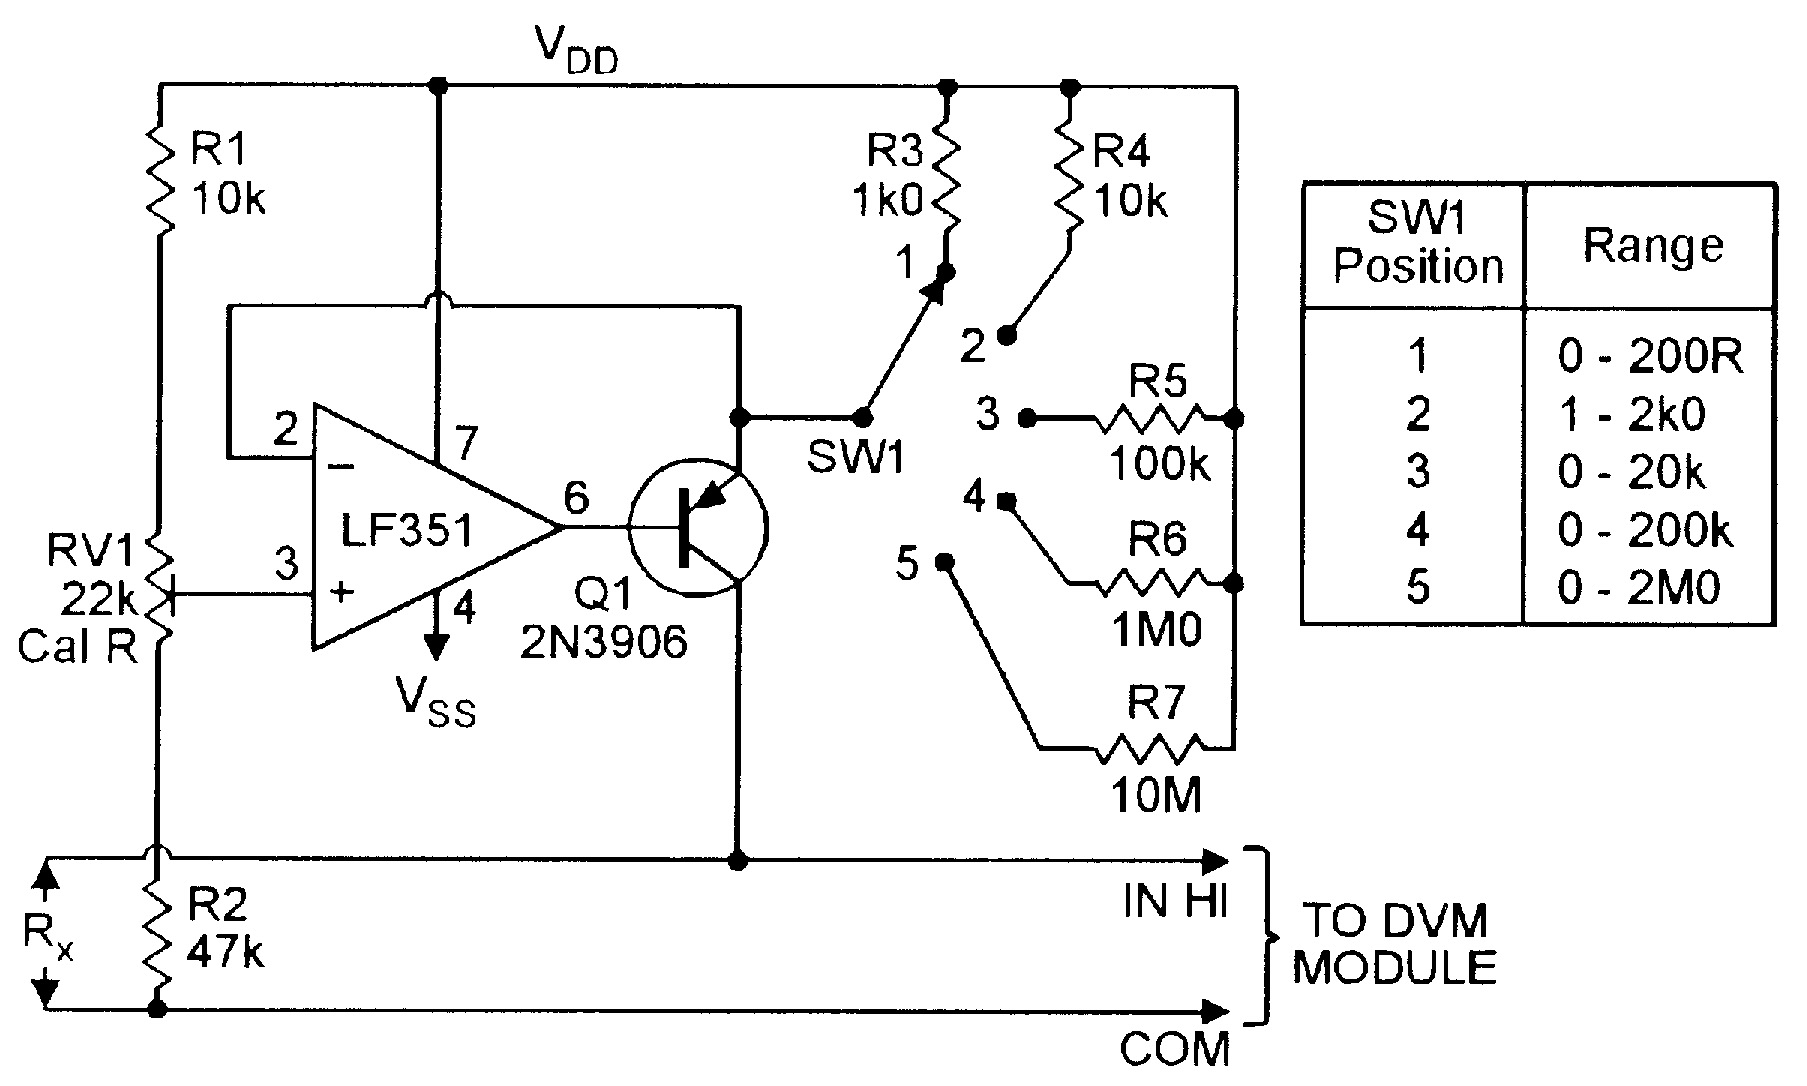 Dc Voltmeter Circuit Wiring Diagram Master Blogs Simple Digital Op Amp Cookbook Part 4 Nuts Volts Magazine Basic Ac